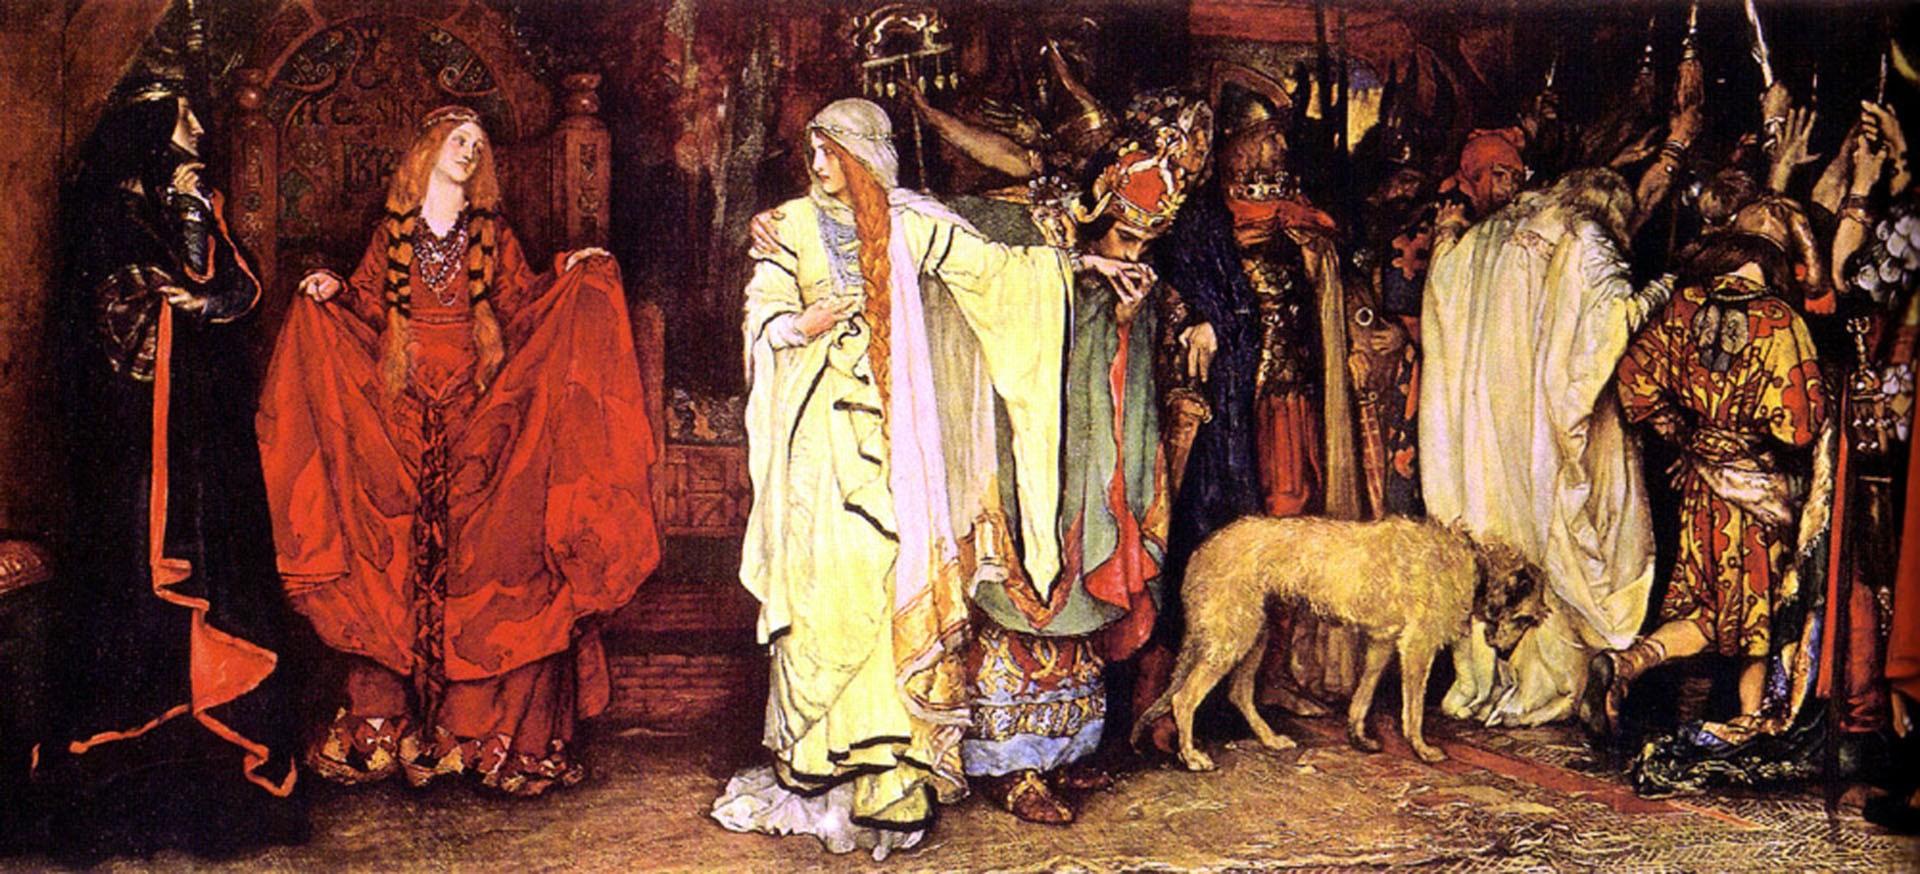 falstaff and king lear essay